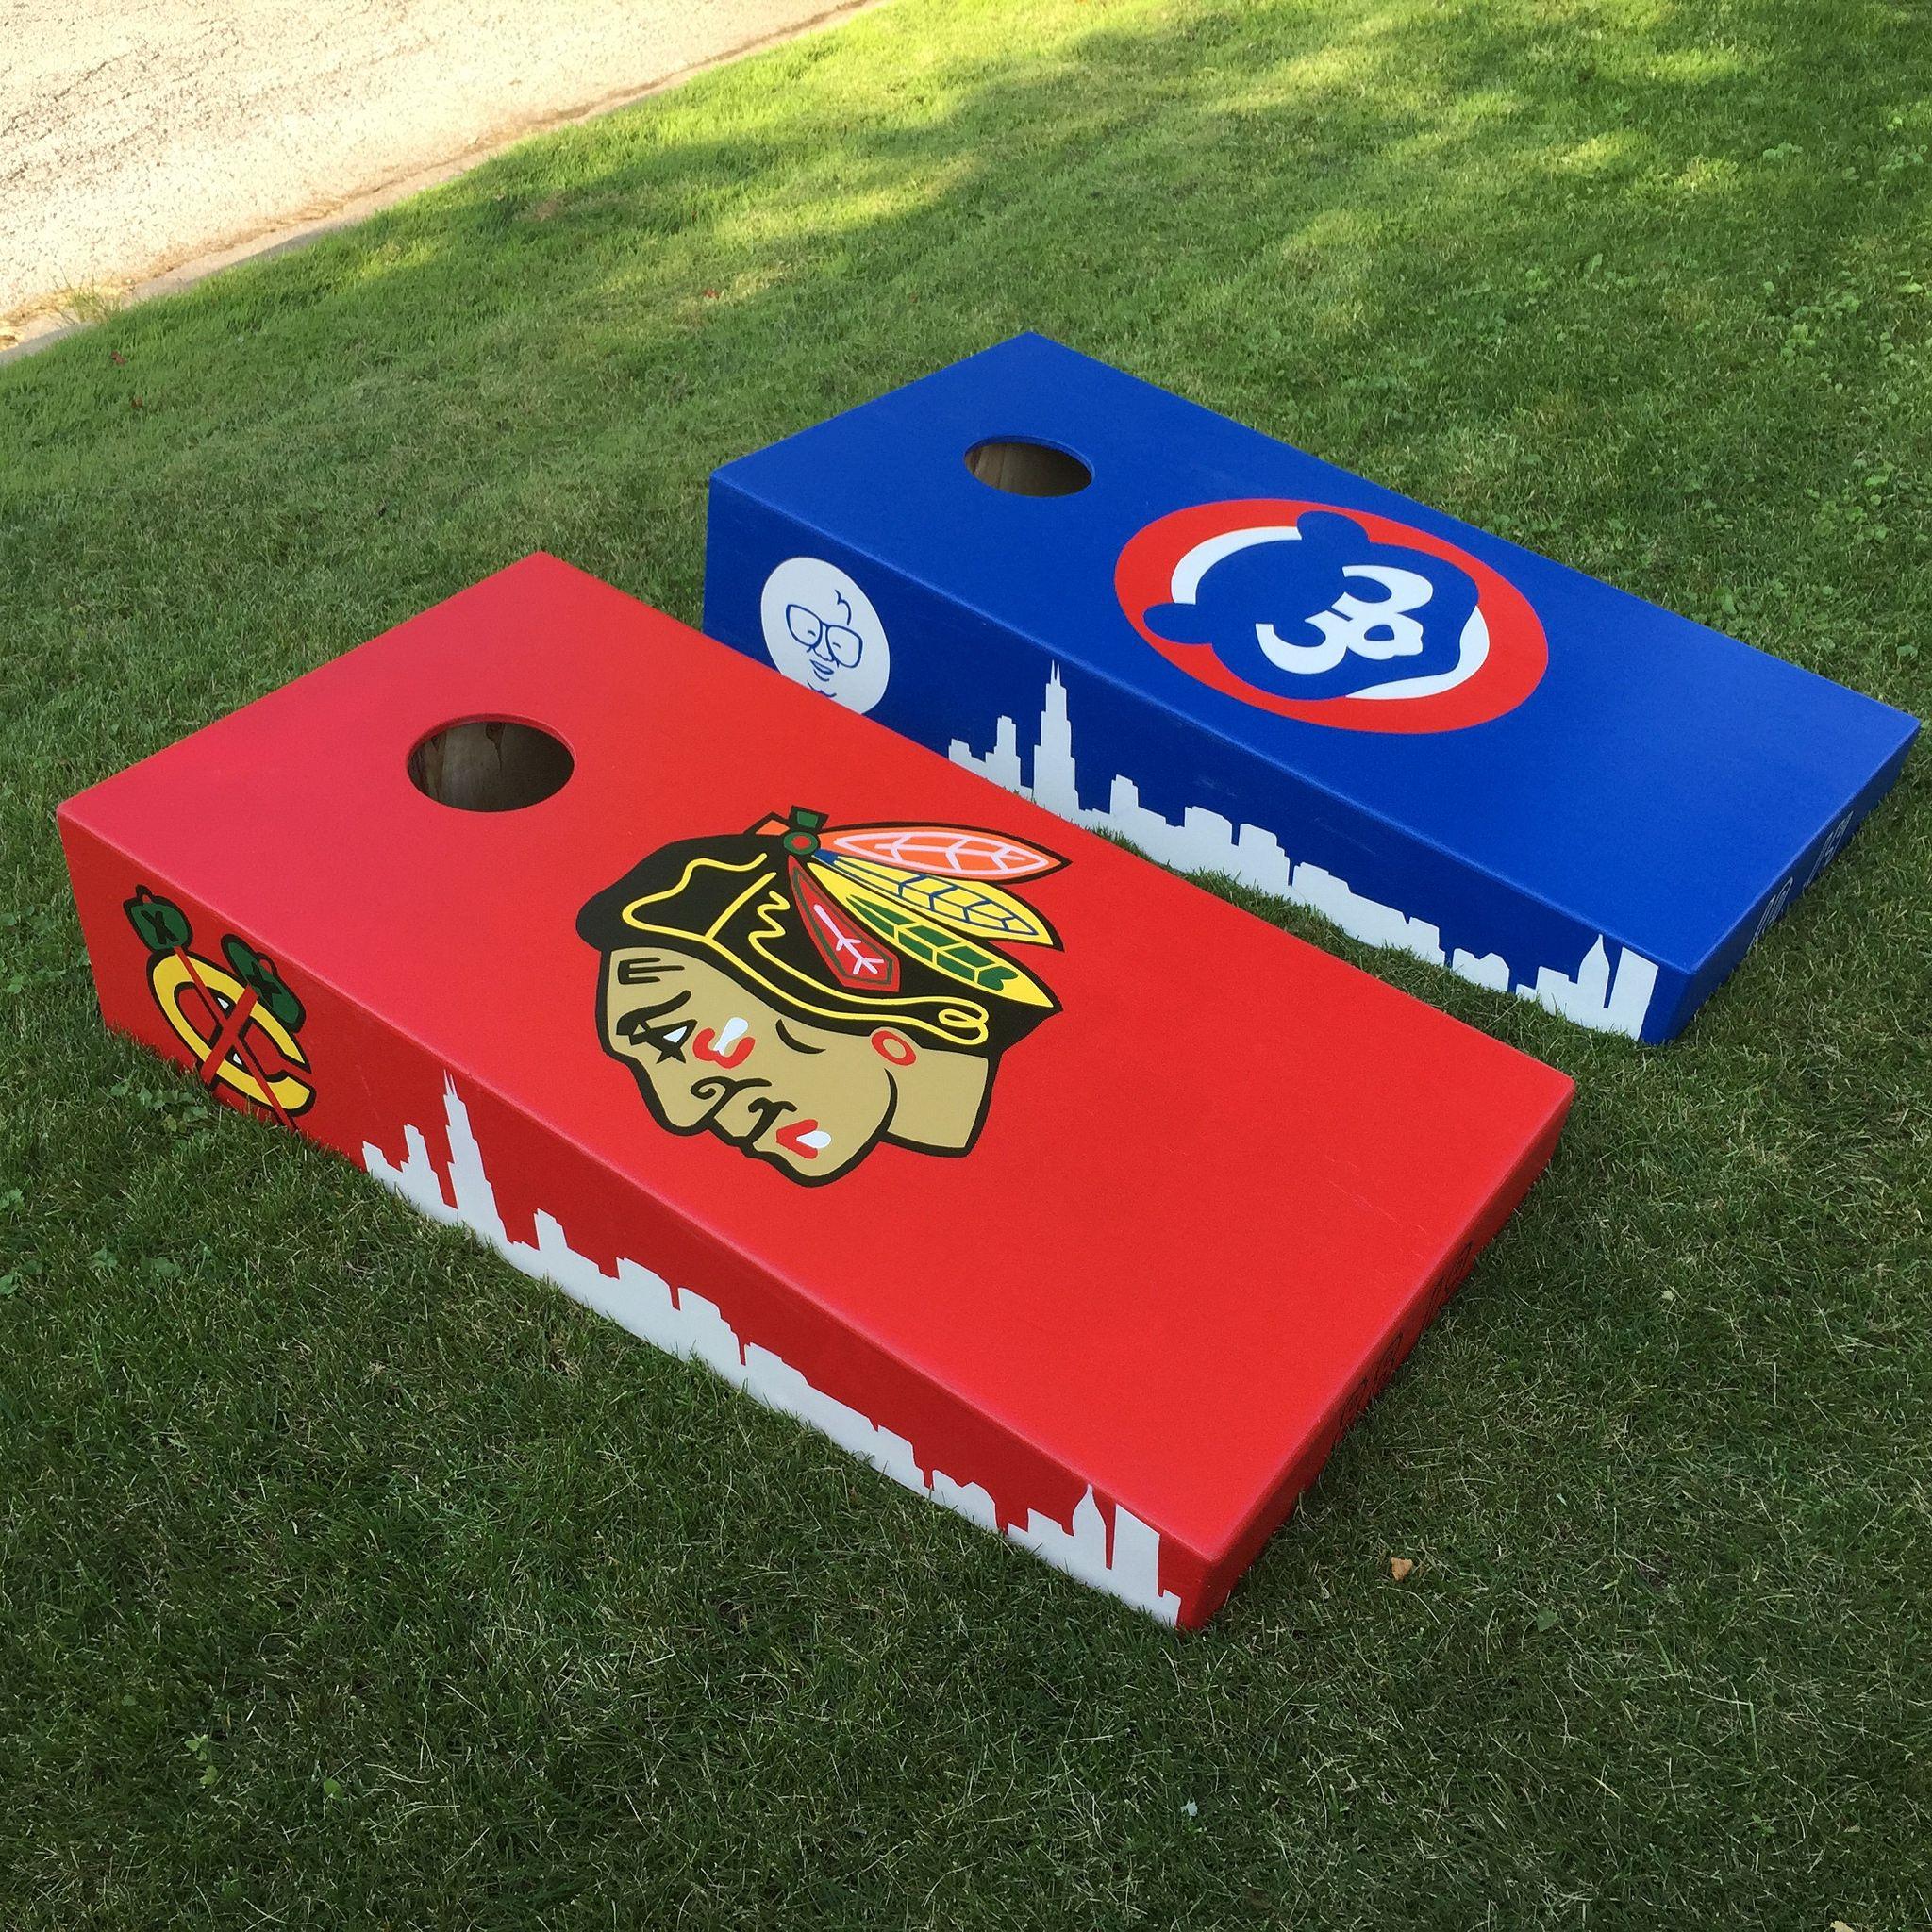 chicago blackhawks and cubs custom cornhole boards - Corn Hole Sets